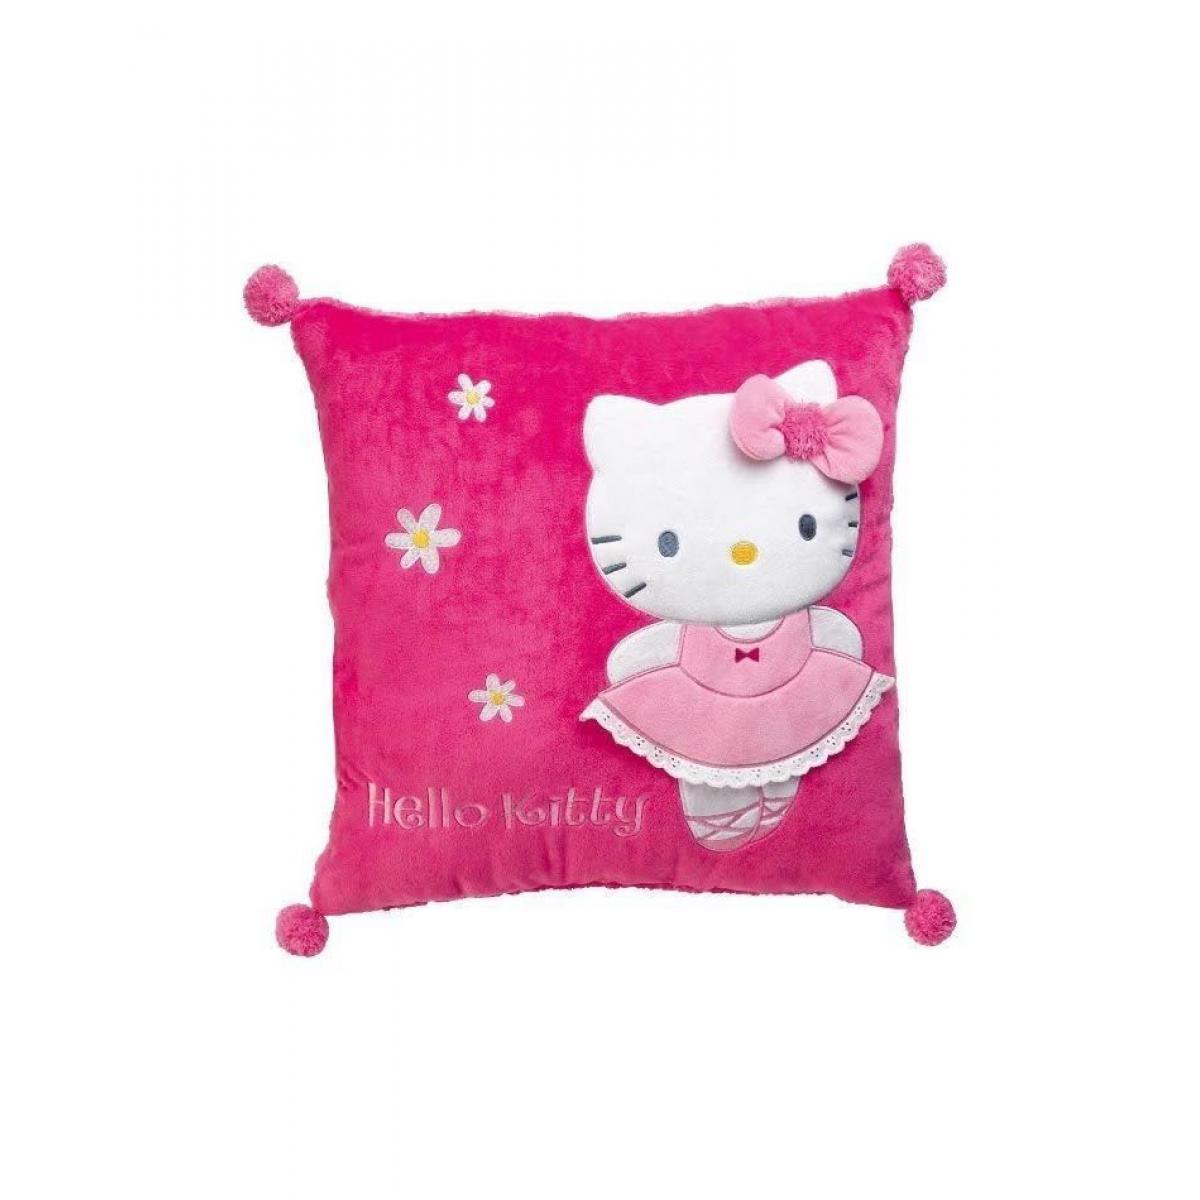 Jemini/Fun House Fun House Hello Kitty coussin carre 35 x 35 cm pour enfant